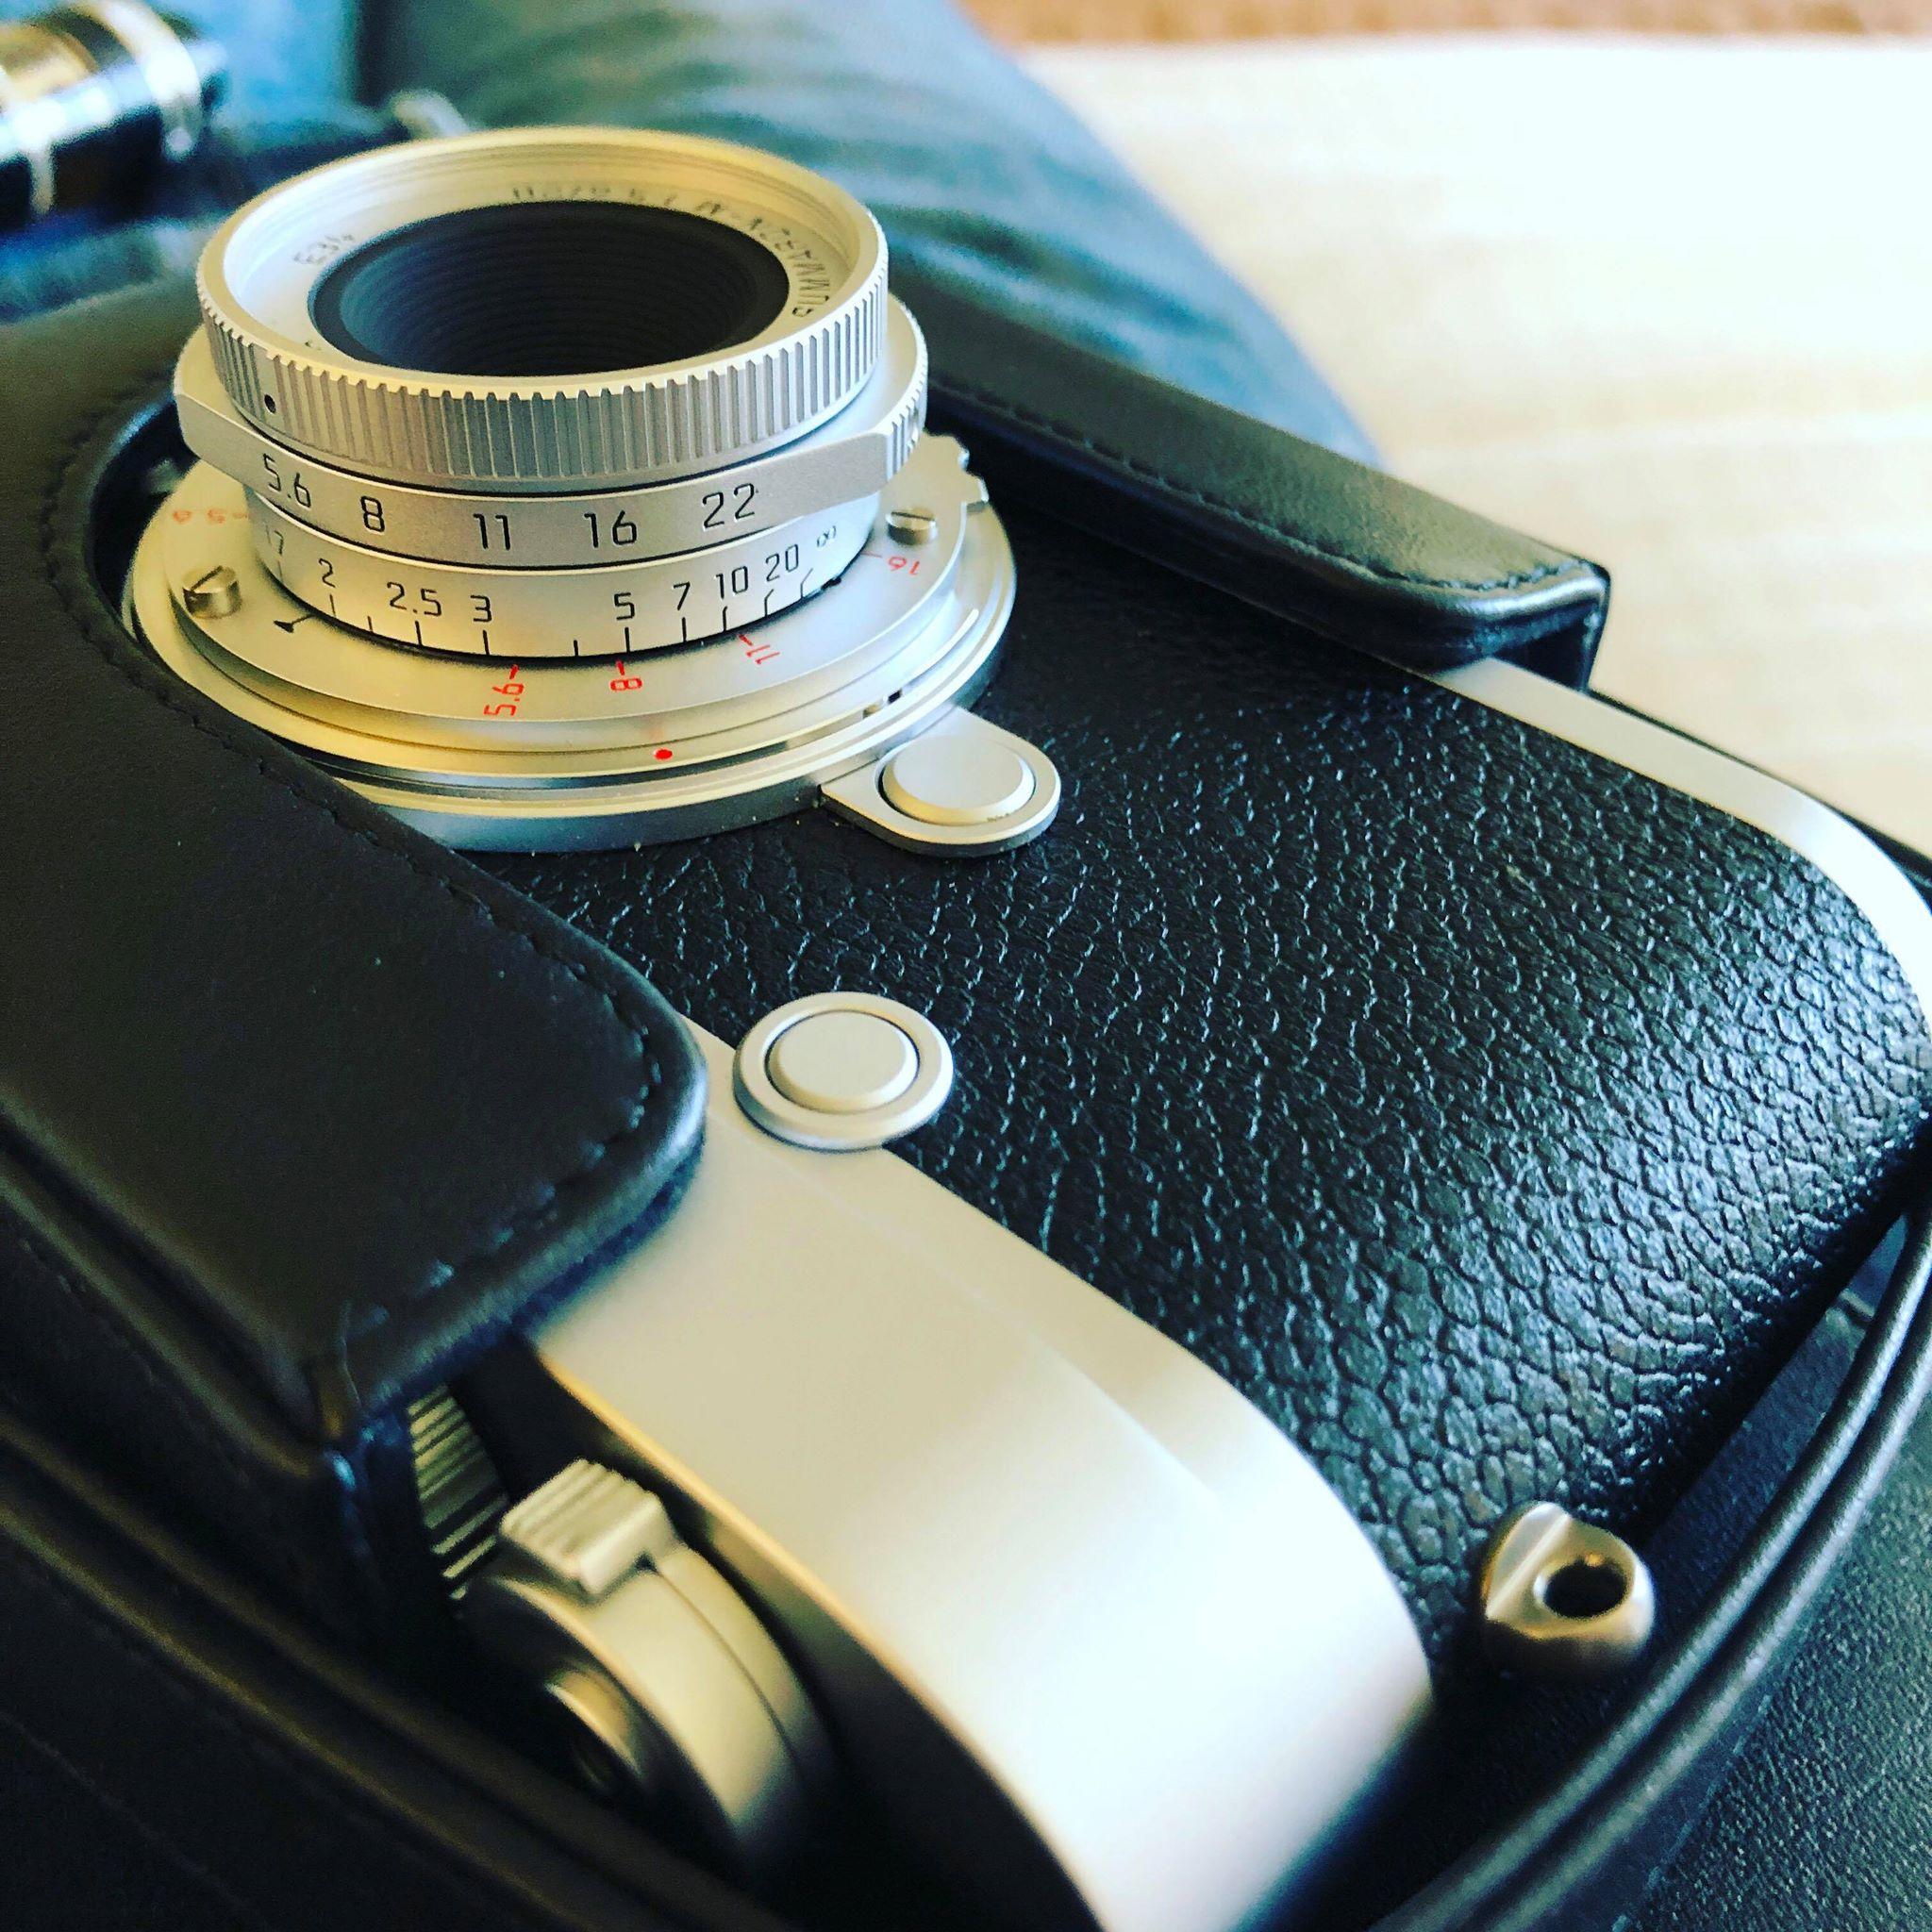 LEICA - Summaron-M 28mm f/5.6 Lens